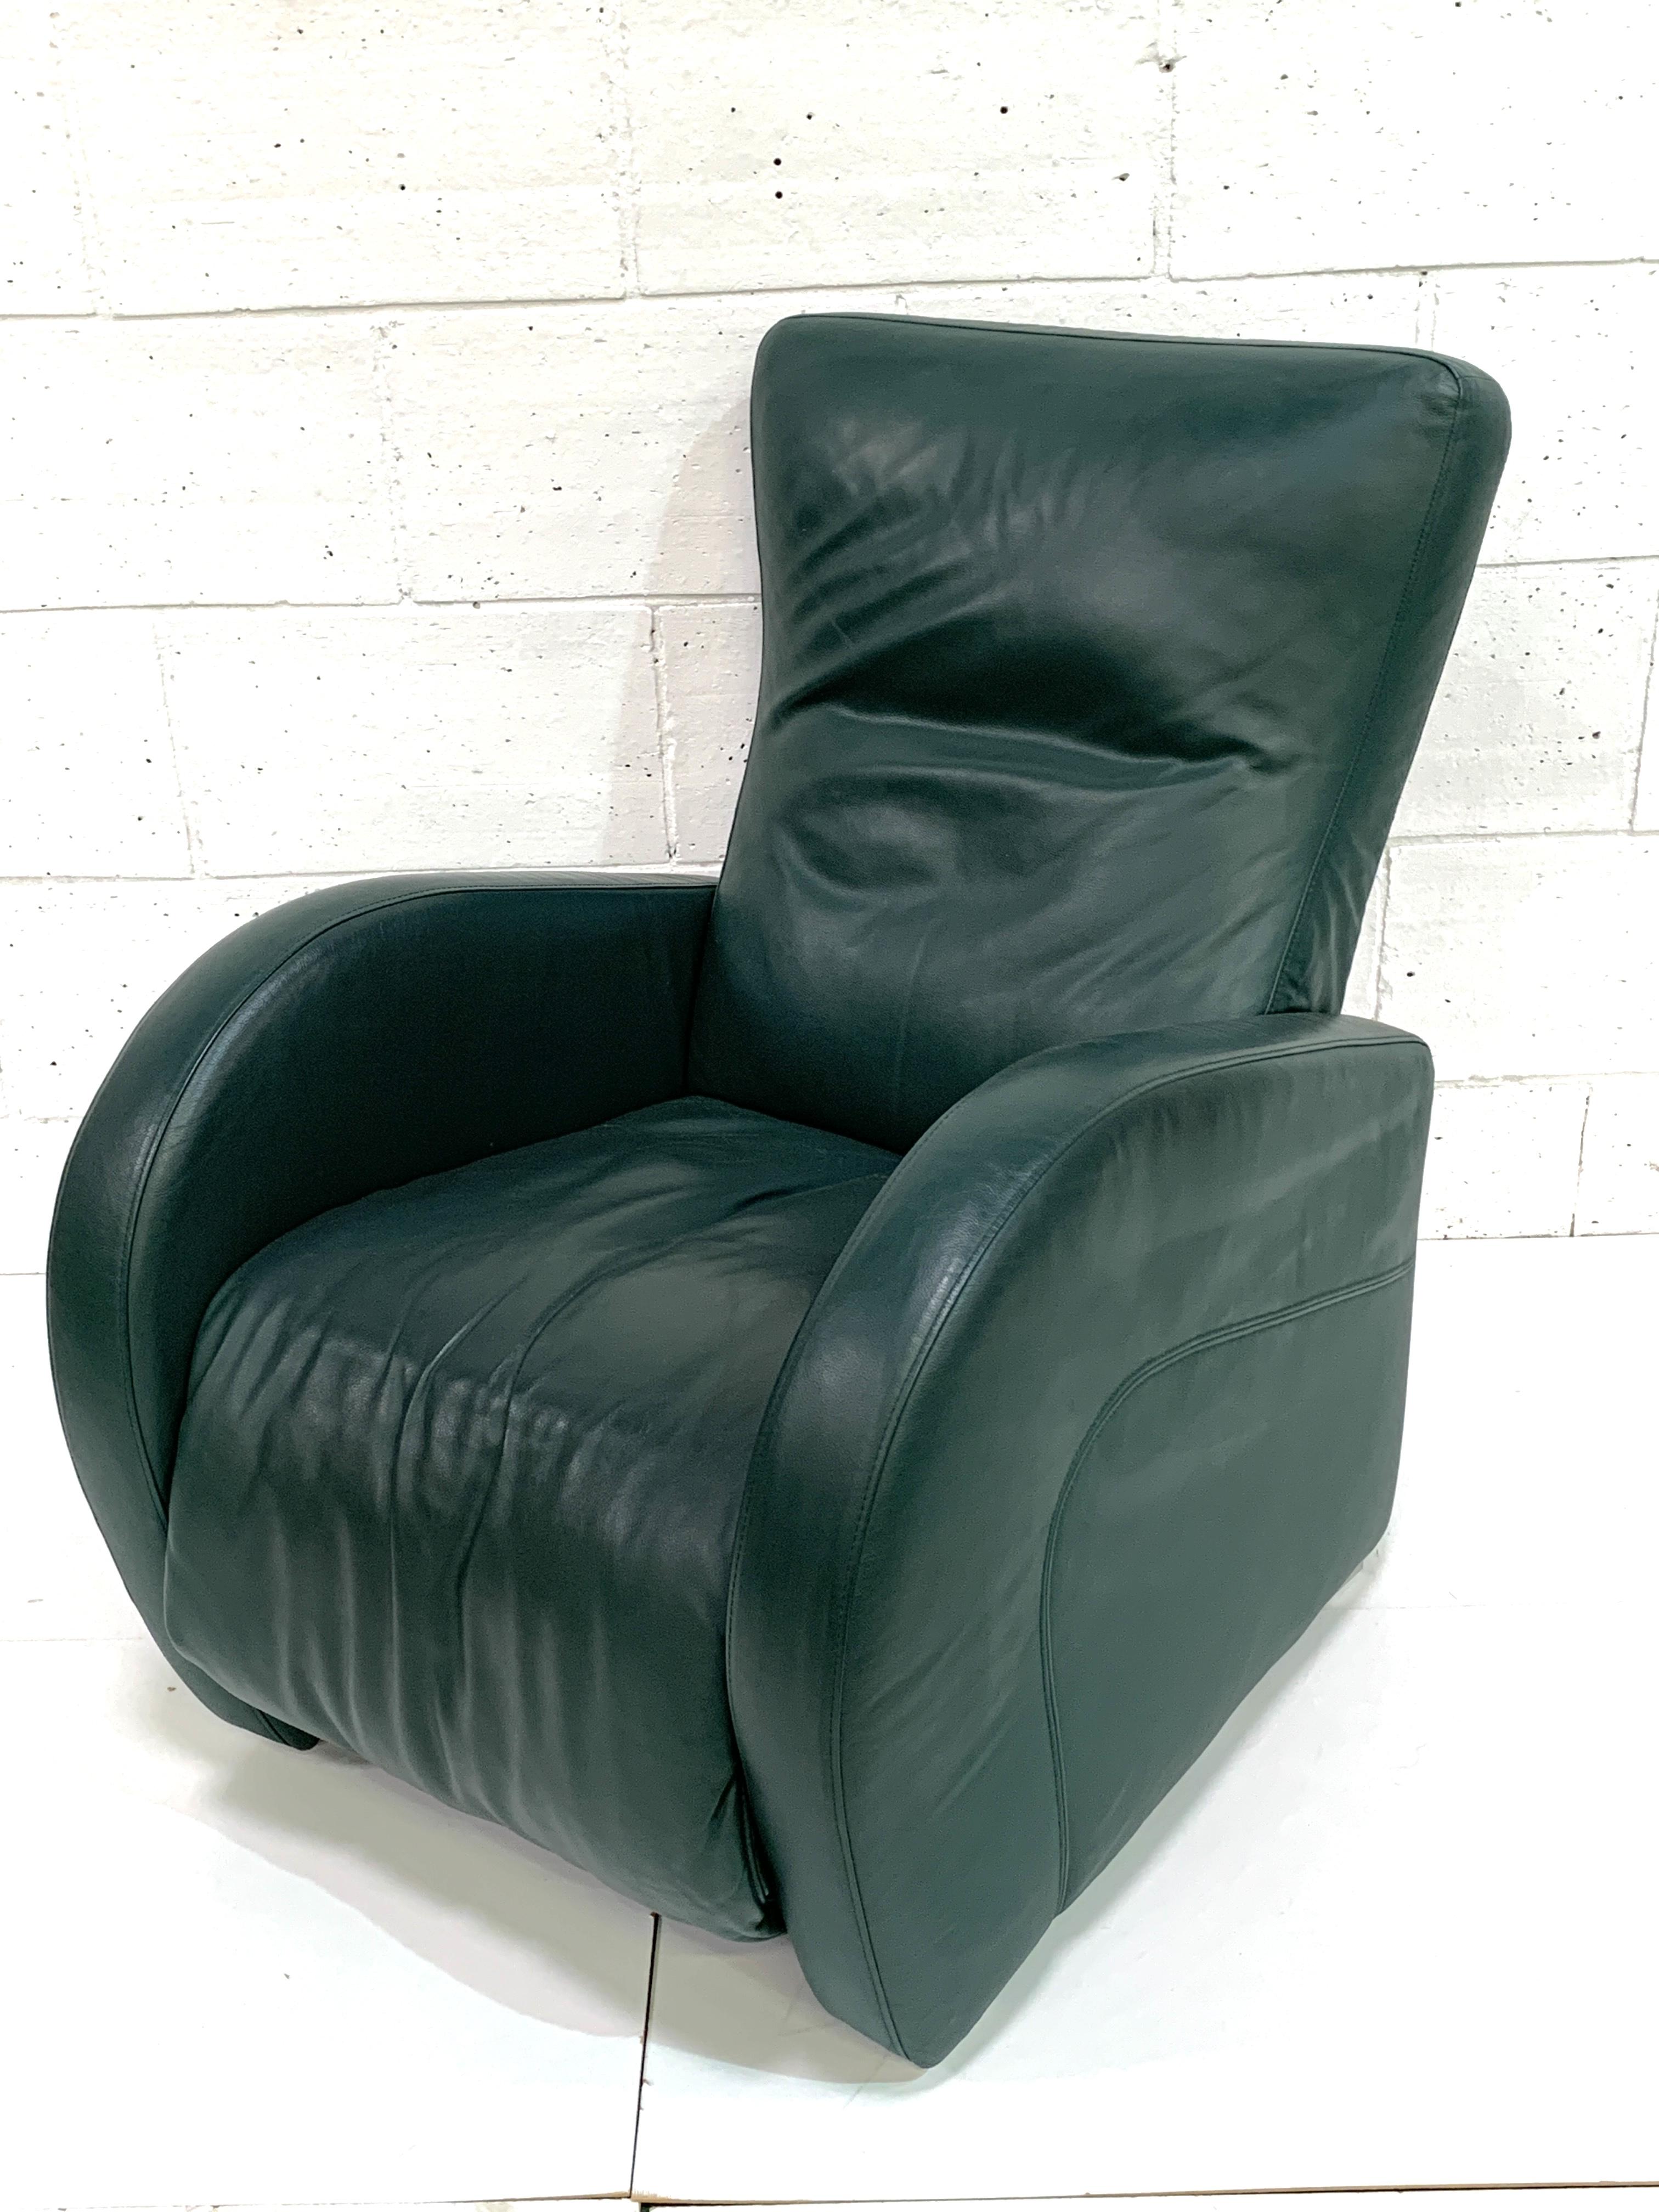 Steinhoff TV reclinable armchair - Image 2 of 4